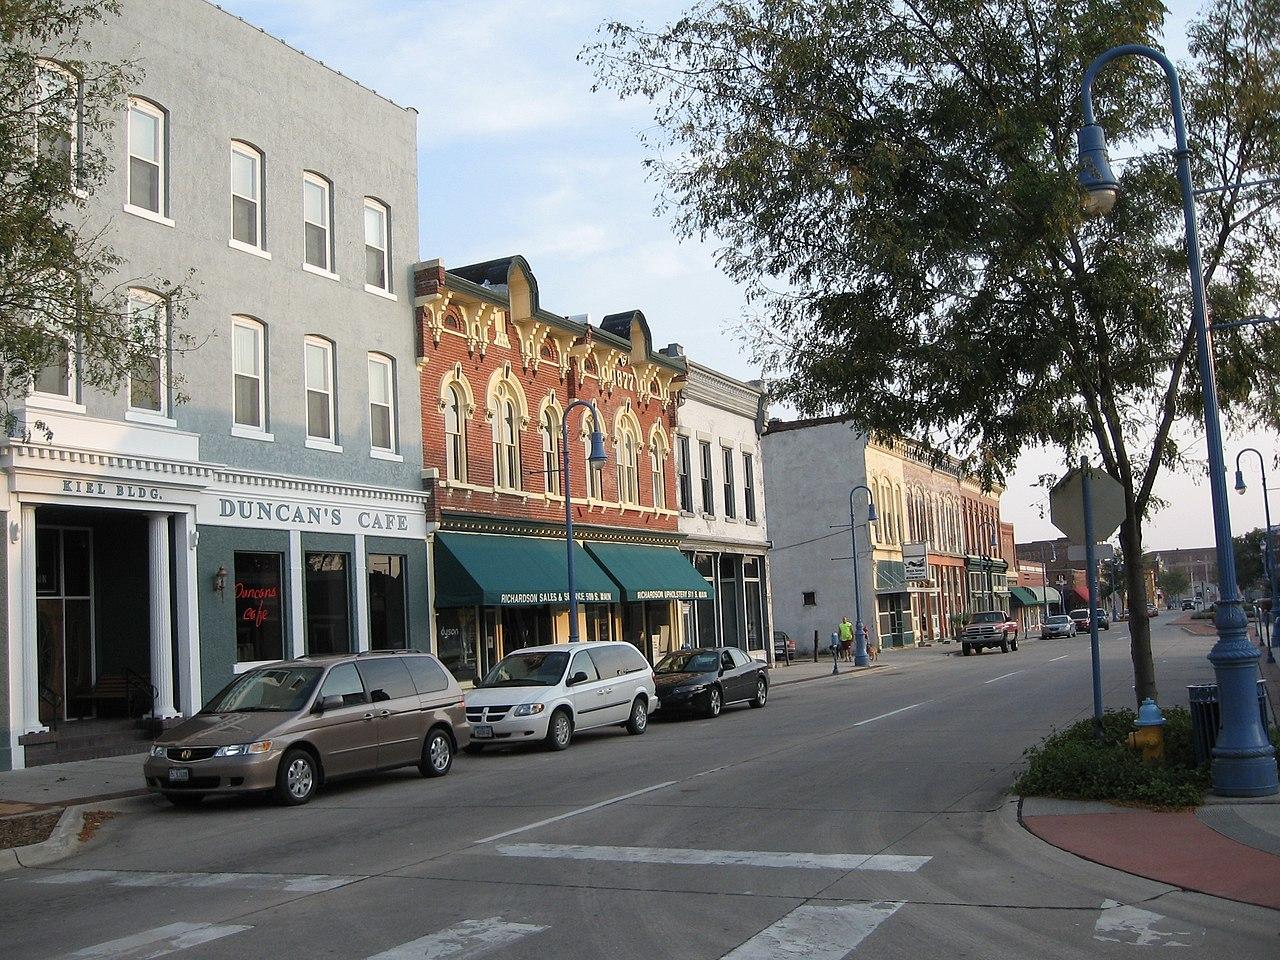 File:Council Bluffs, Iowa, Old Town.jpg - Wikimedia Commonsiowa town